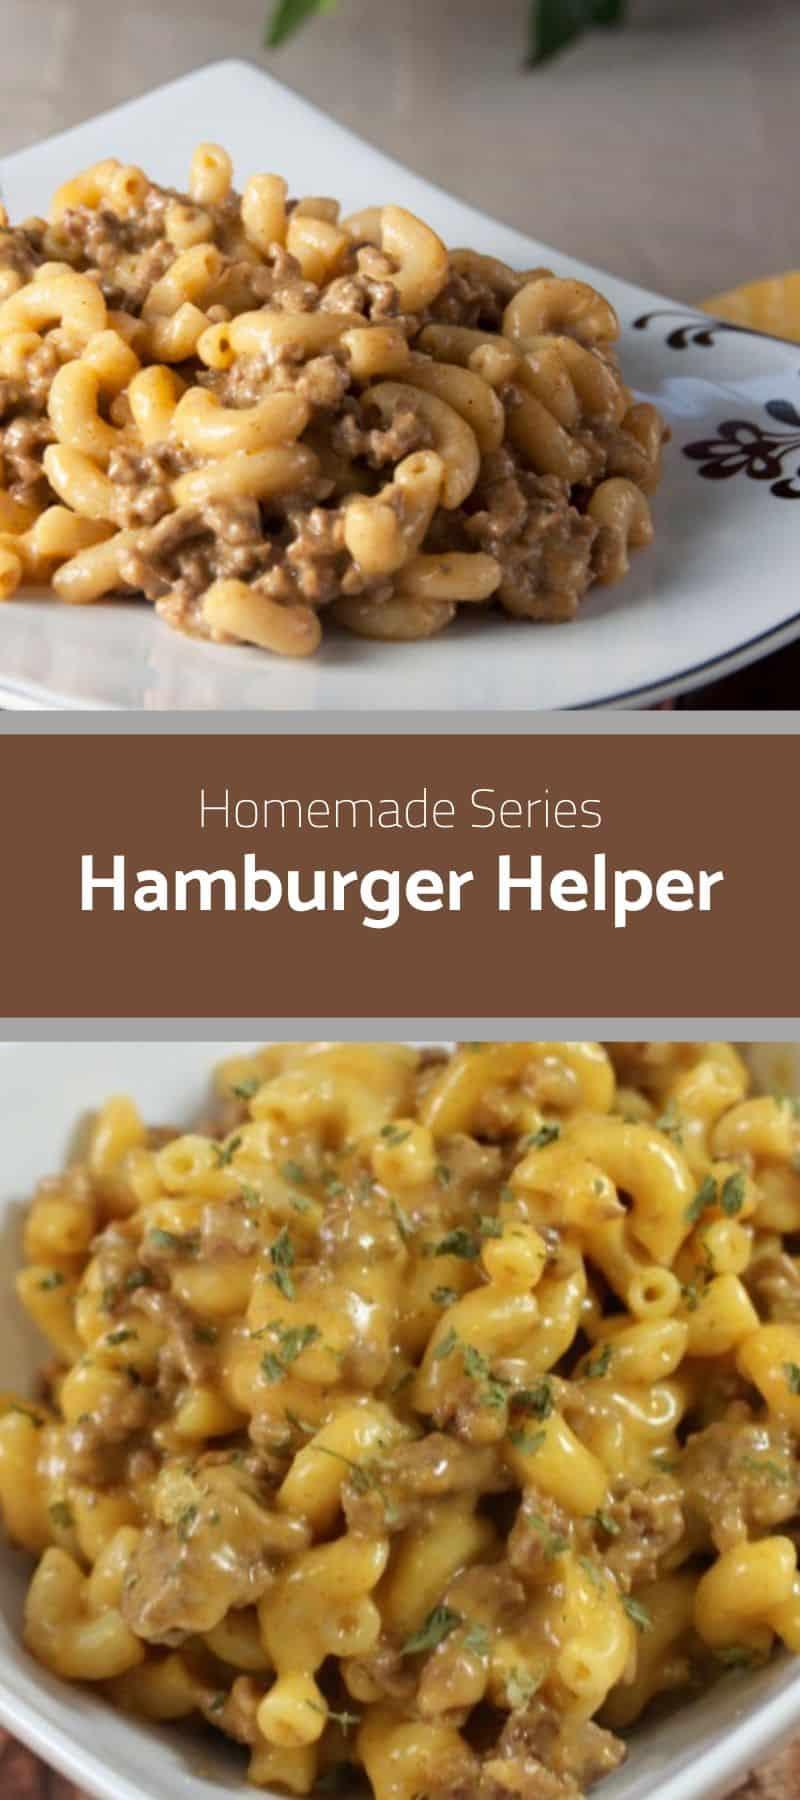 Homemade Hamburger Helper Recipe 3